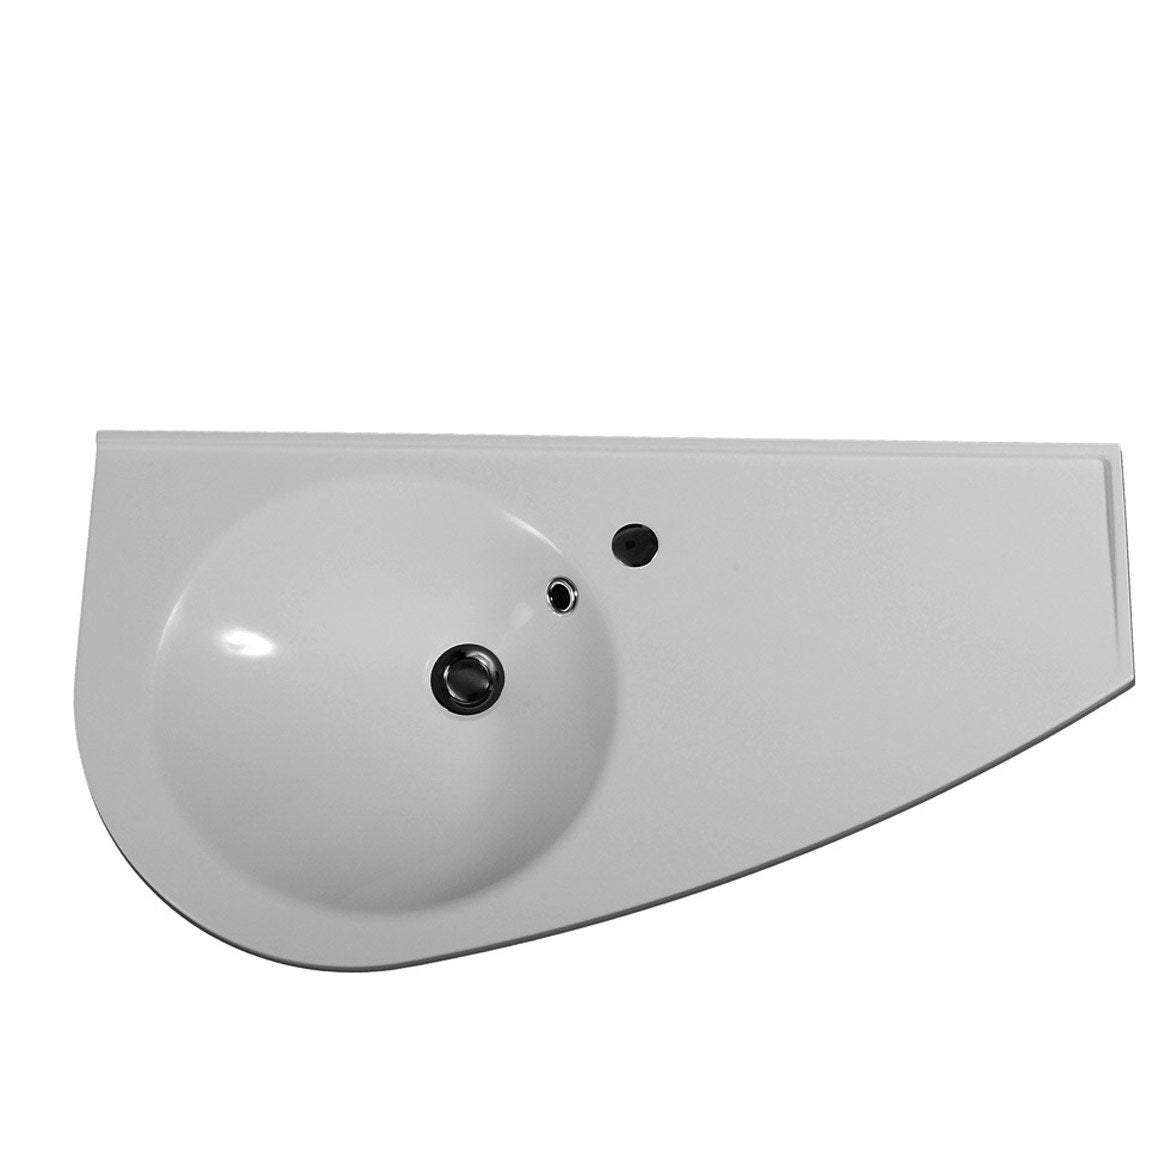 Plan vasque esquisse gauche 85x44 leroy merlin for Leroy merlin plan vasque